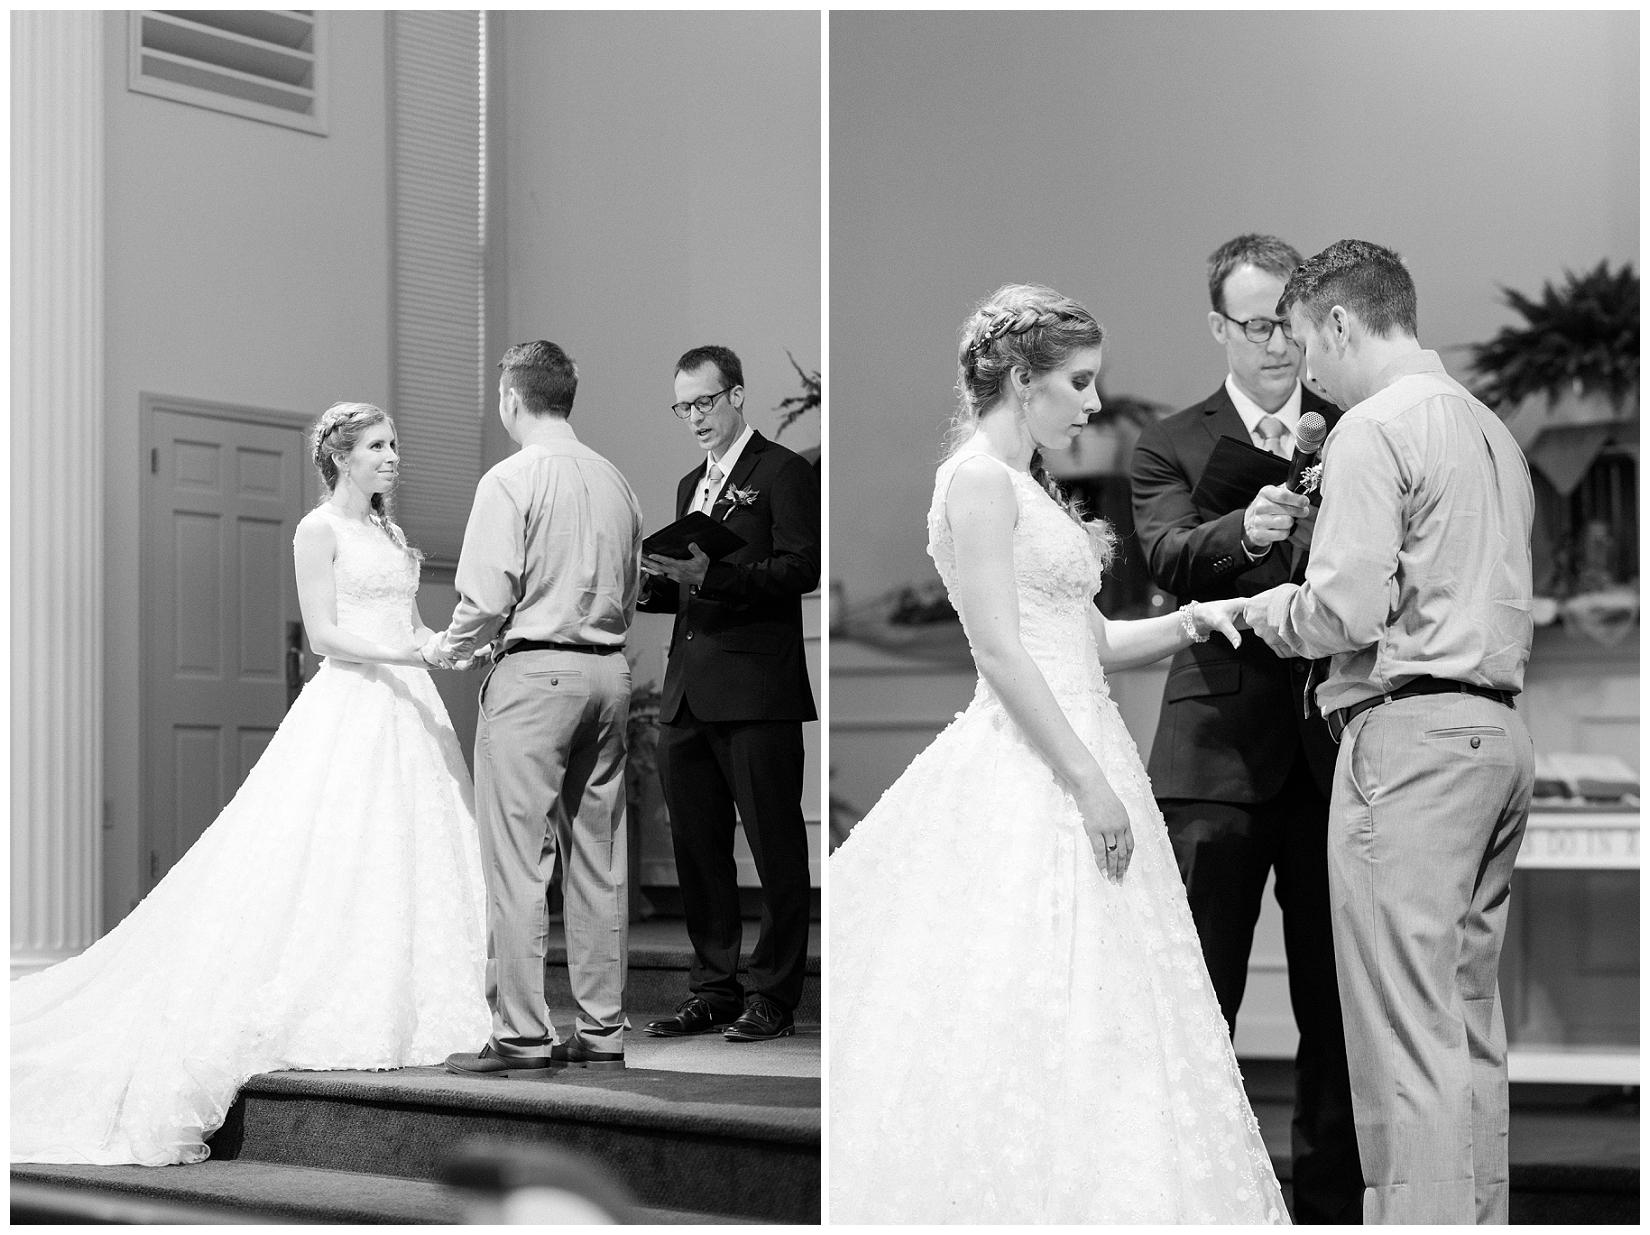 cat-alkire-wedding-photographer-indiana-chicago-indianapolis-fort-wayne_1317.jpg